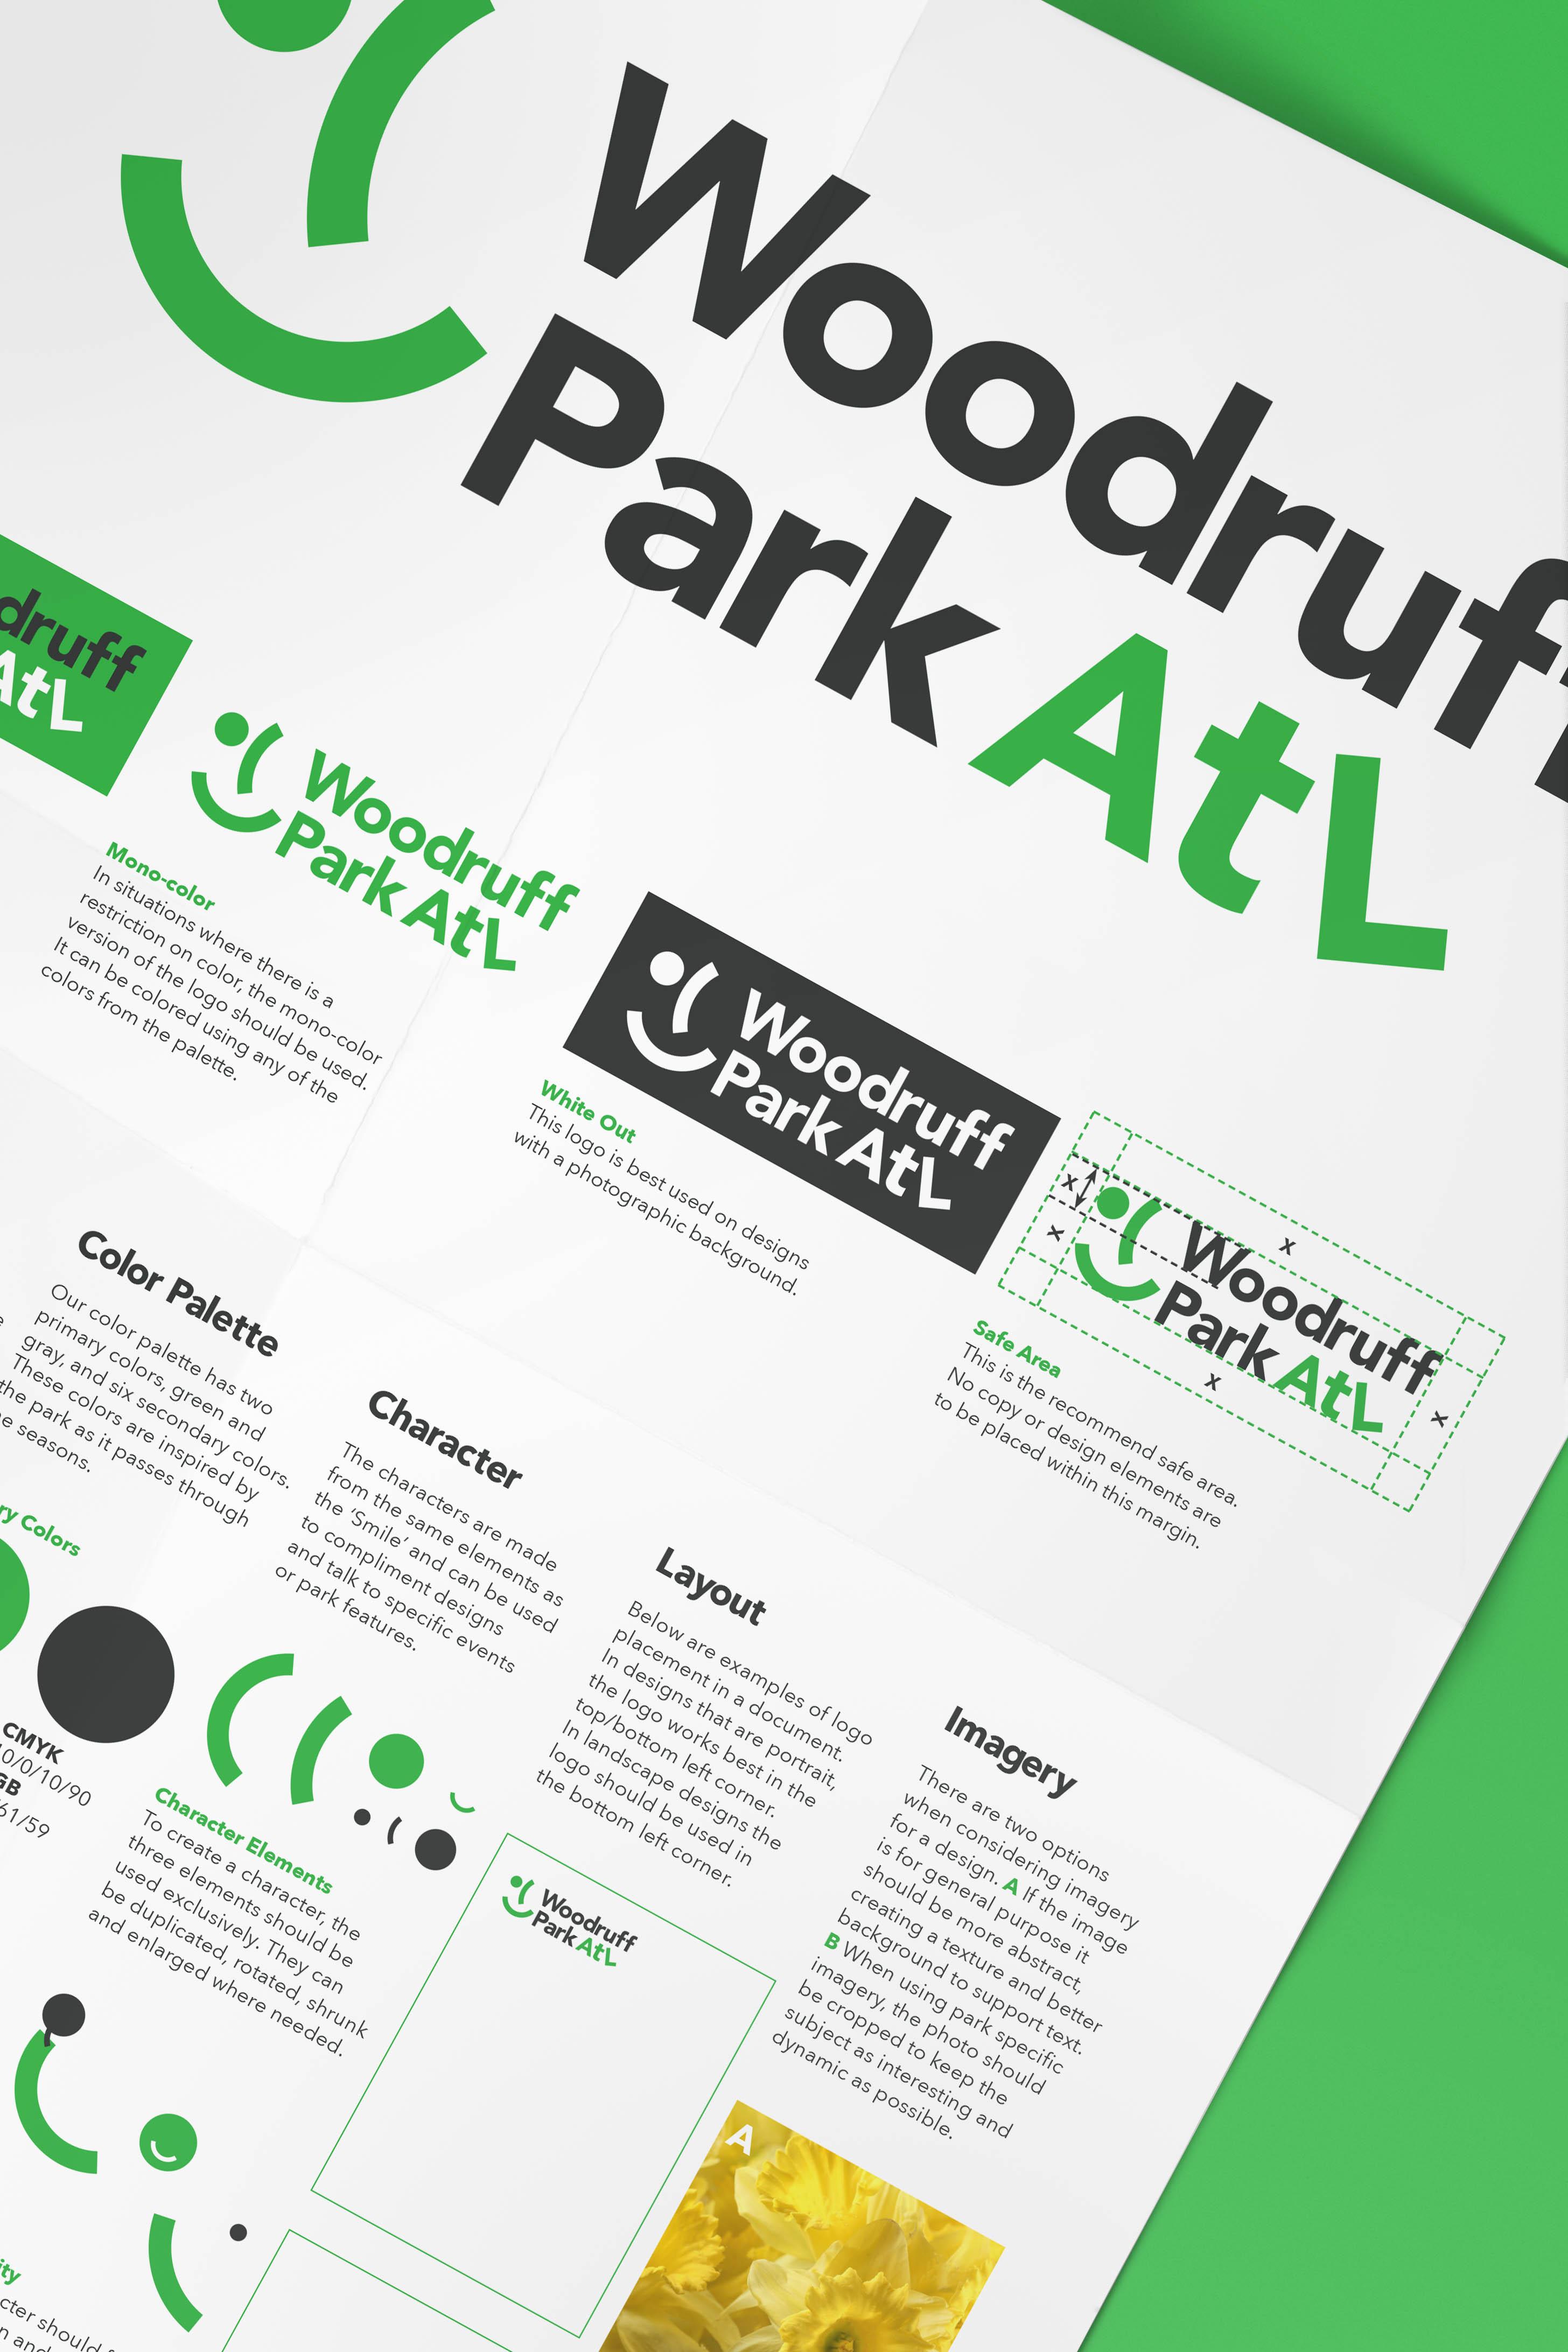 woodruff-park-6-port-1920pxx1080px